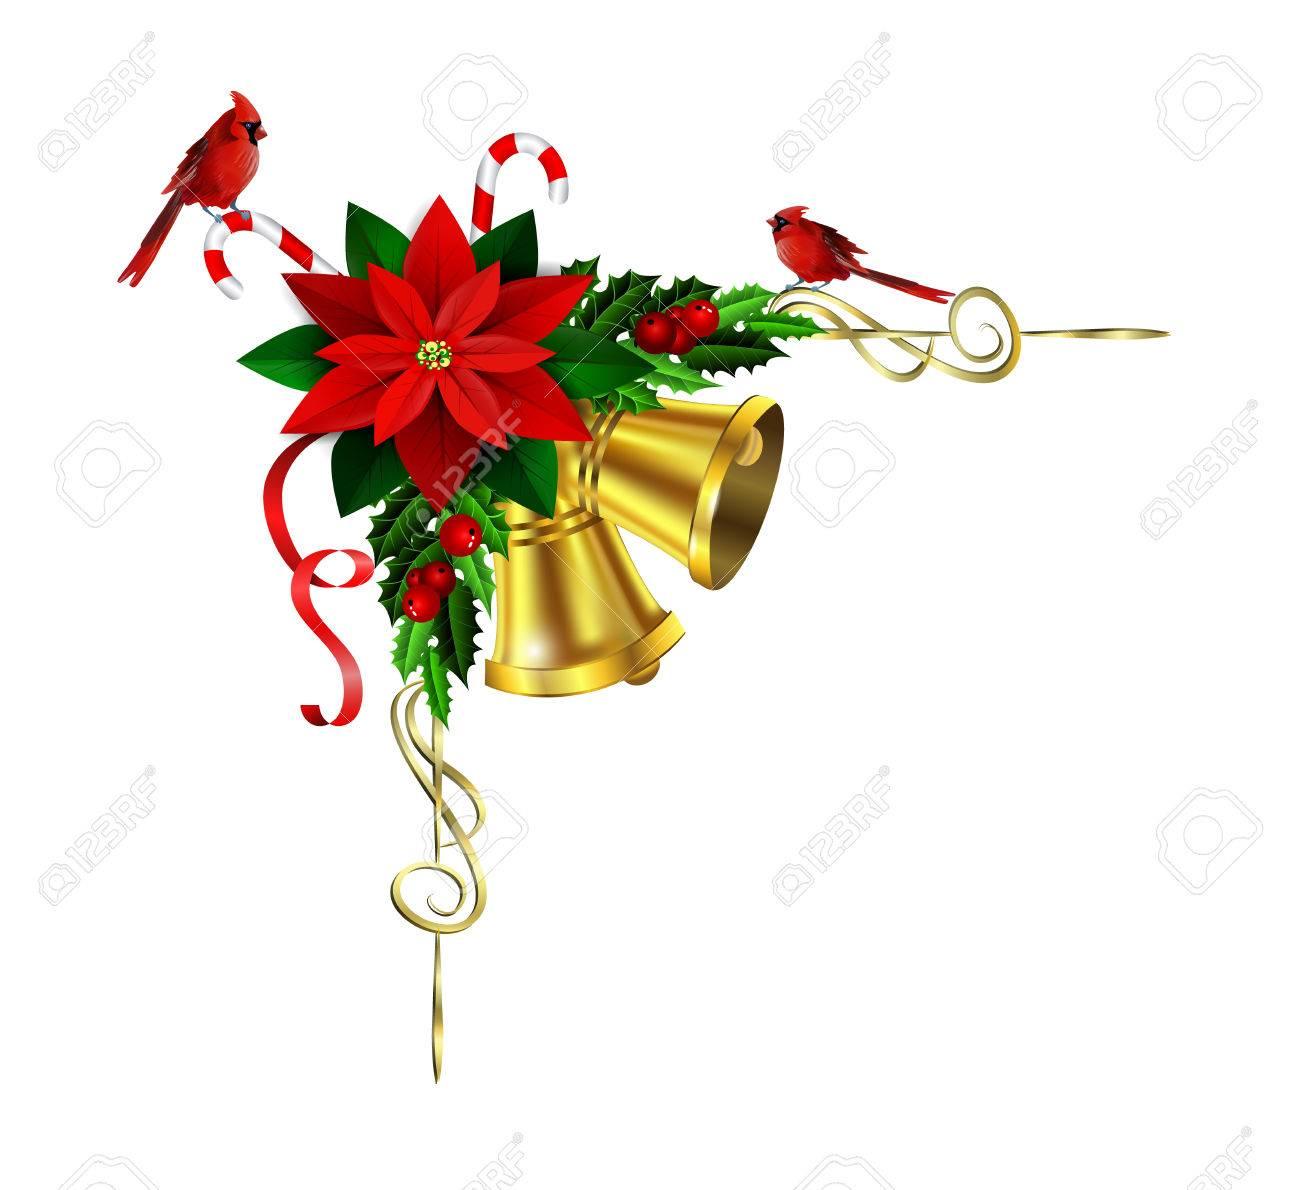 christmas corner decoration with evergreen treess holly and pinecone rh 123rf com Christmas around the Corner Clip Art christmas holly corner clip art